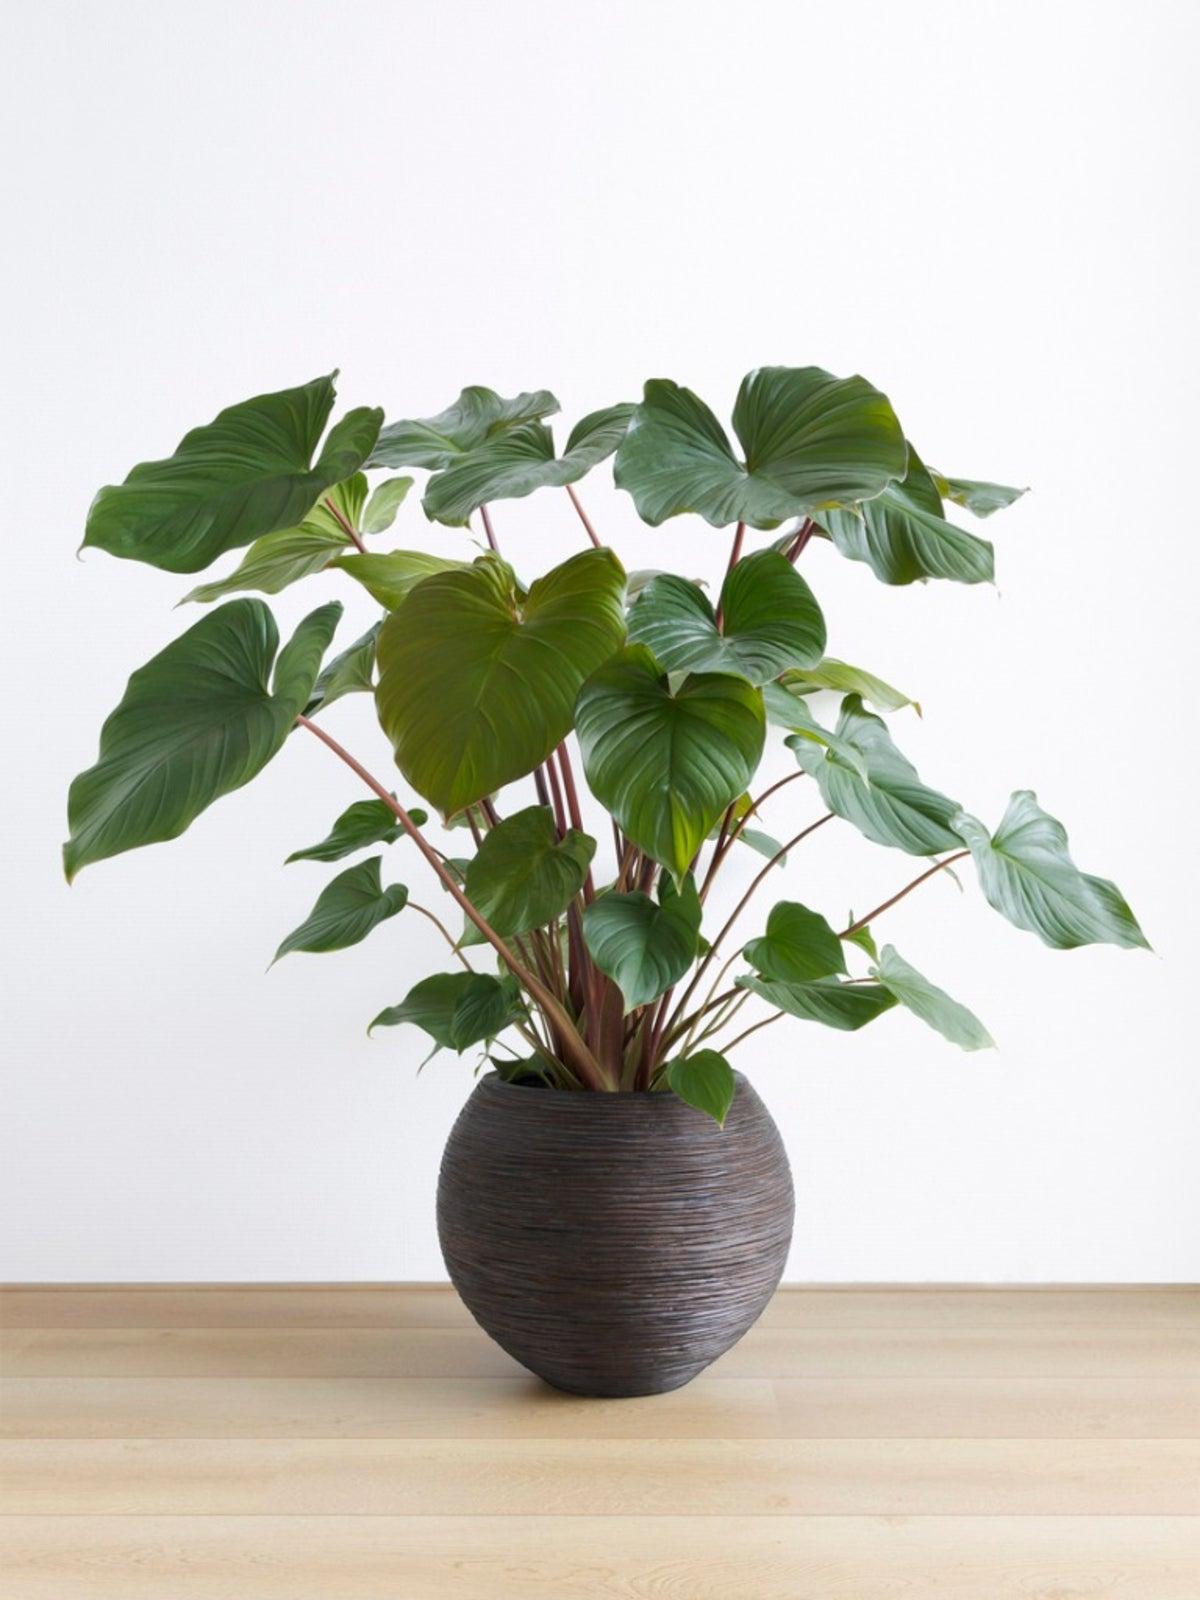 Homalomena Care   Tips For Growing Homalomena Plants